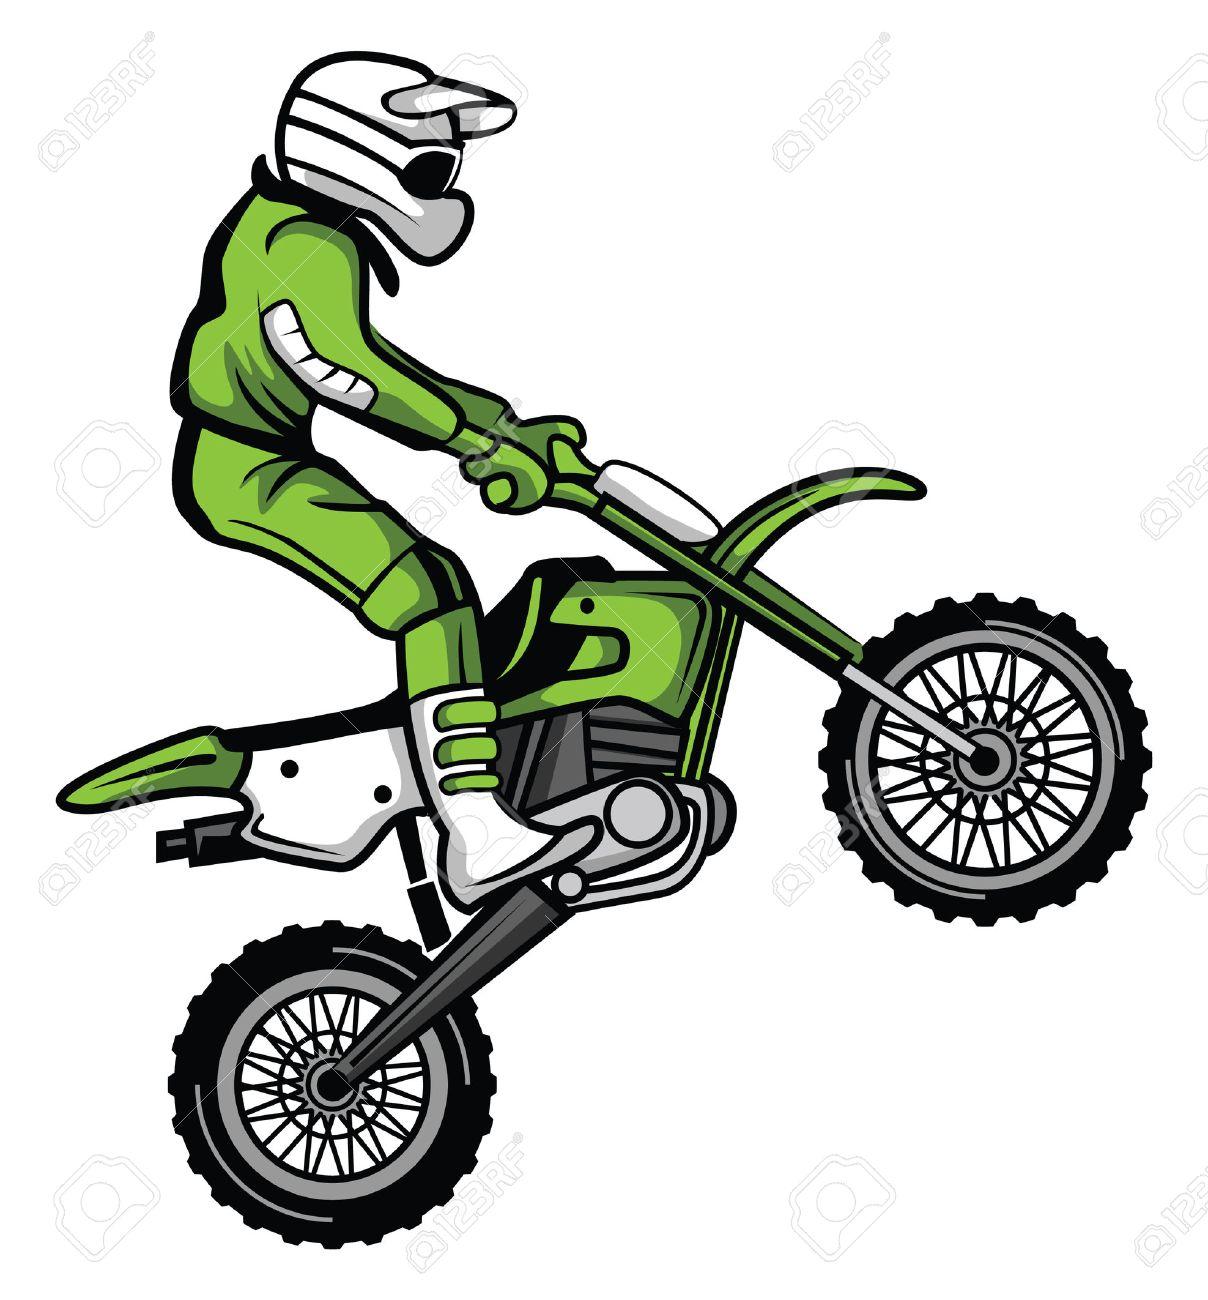 1208x1300 Astonishing Motocross Clipart 3 190 Dirt Bike Cliparts Stock